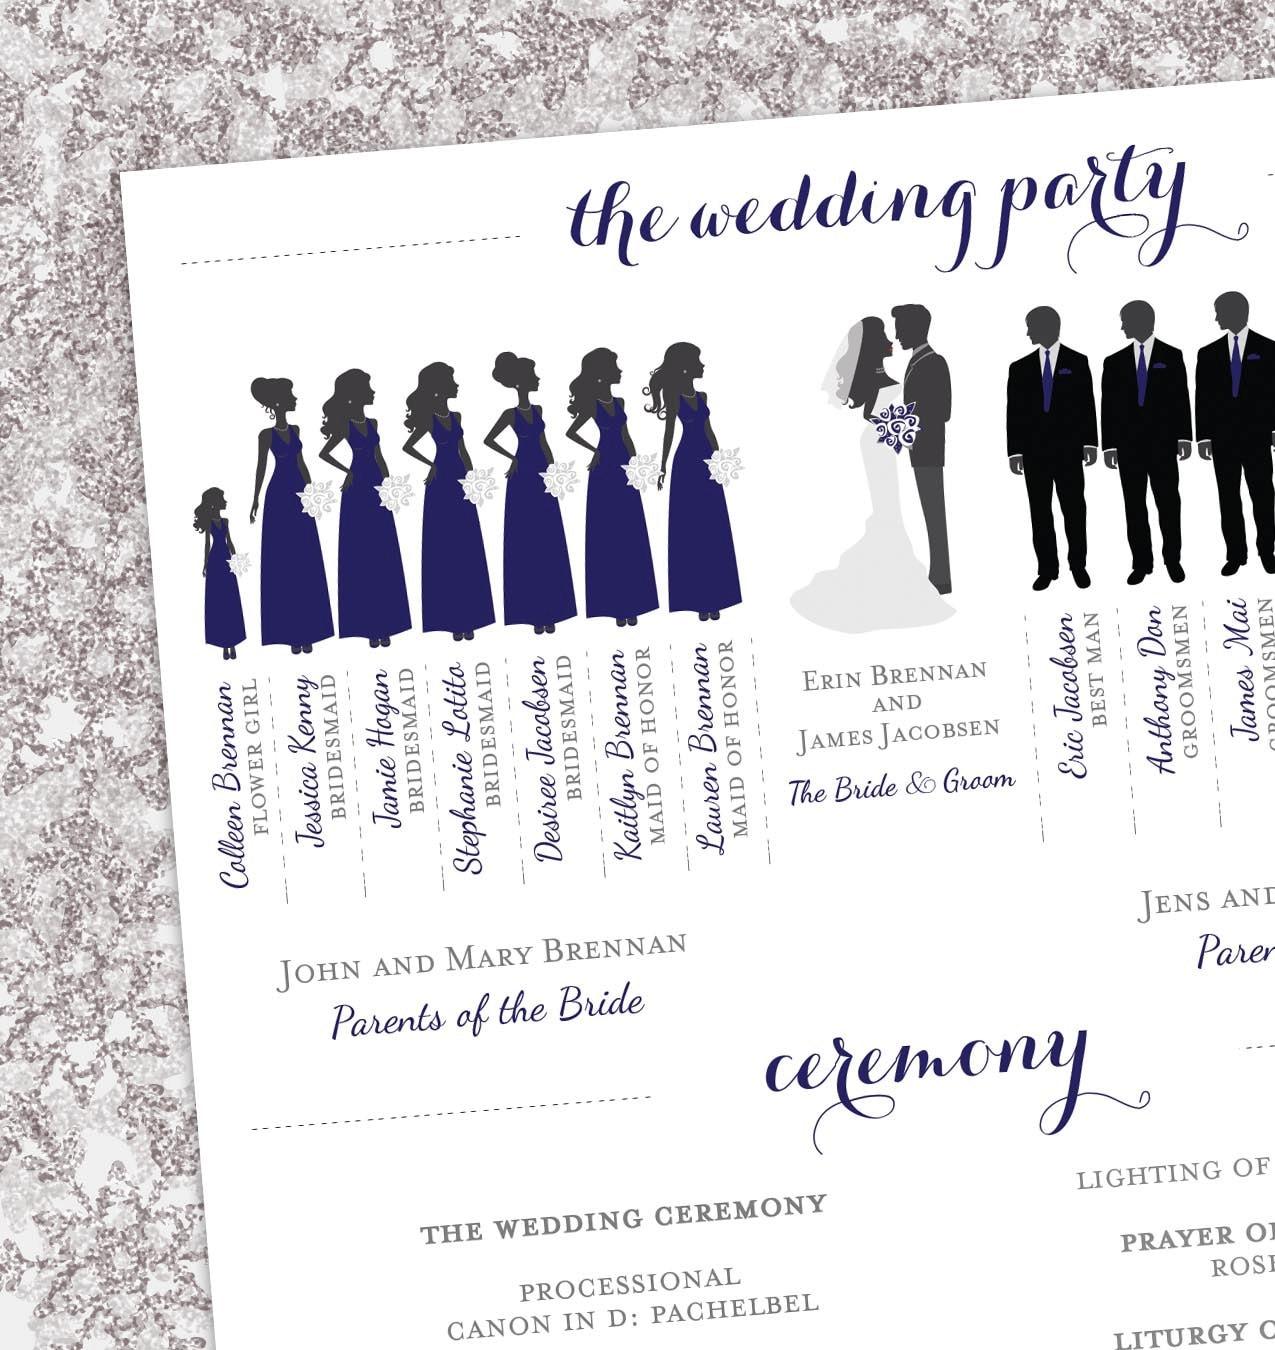 Perfect Winter Wedding Program Bridal Party Silhouettes Digital ZX68